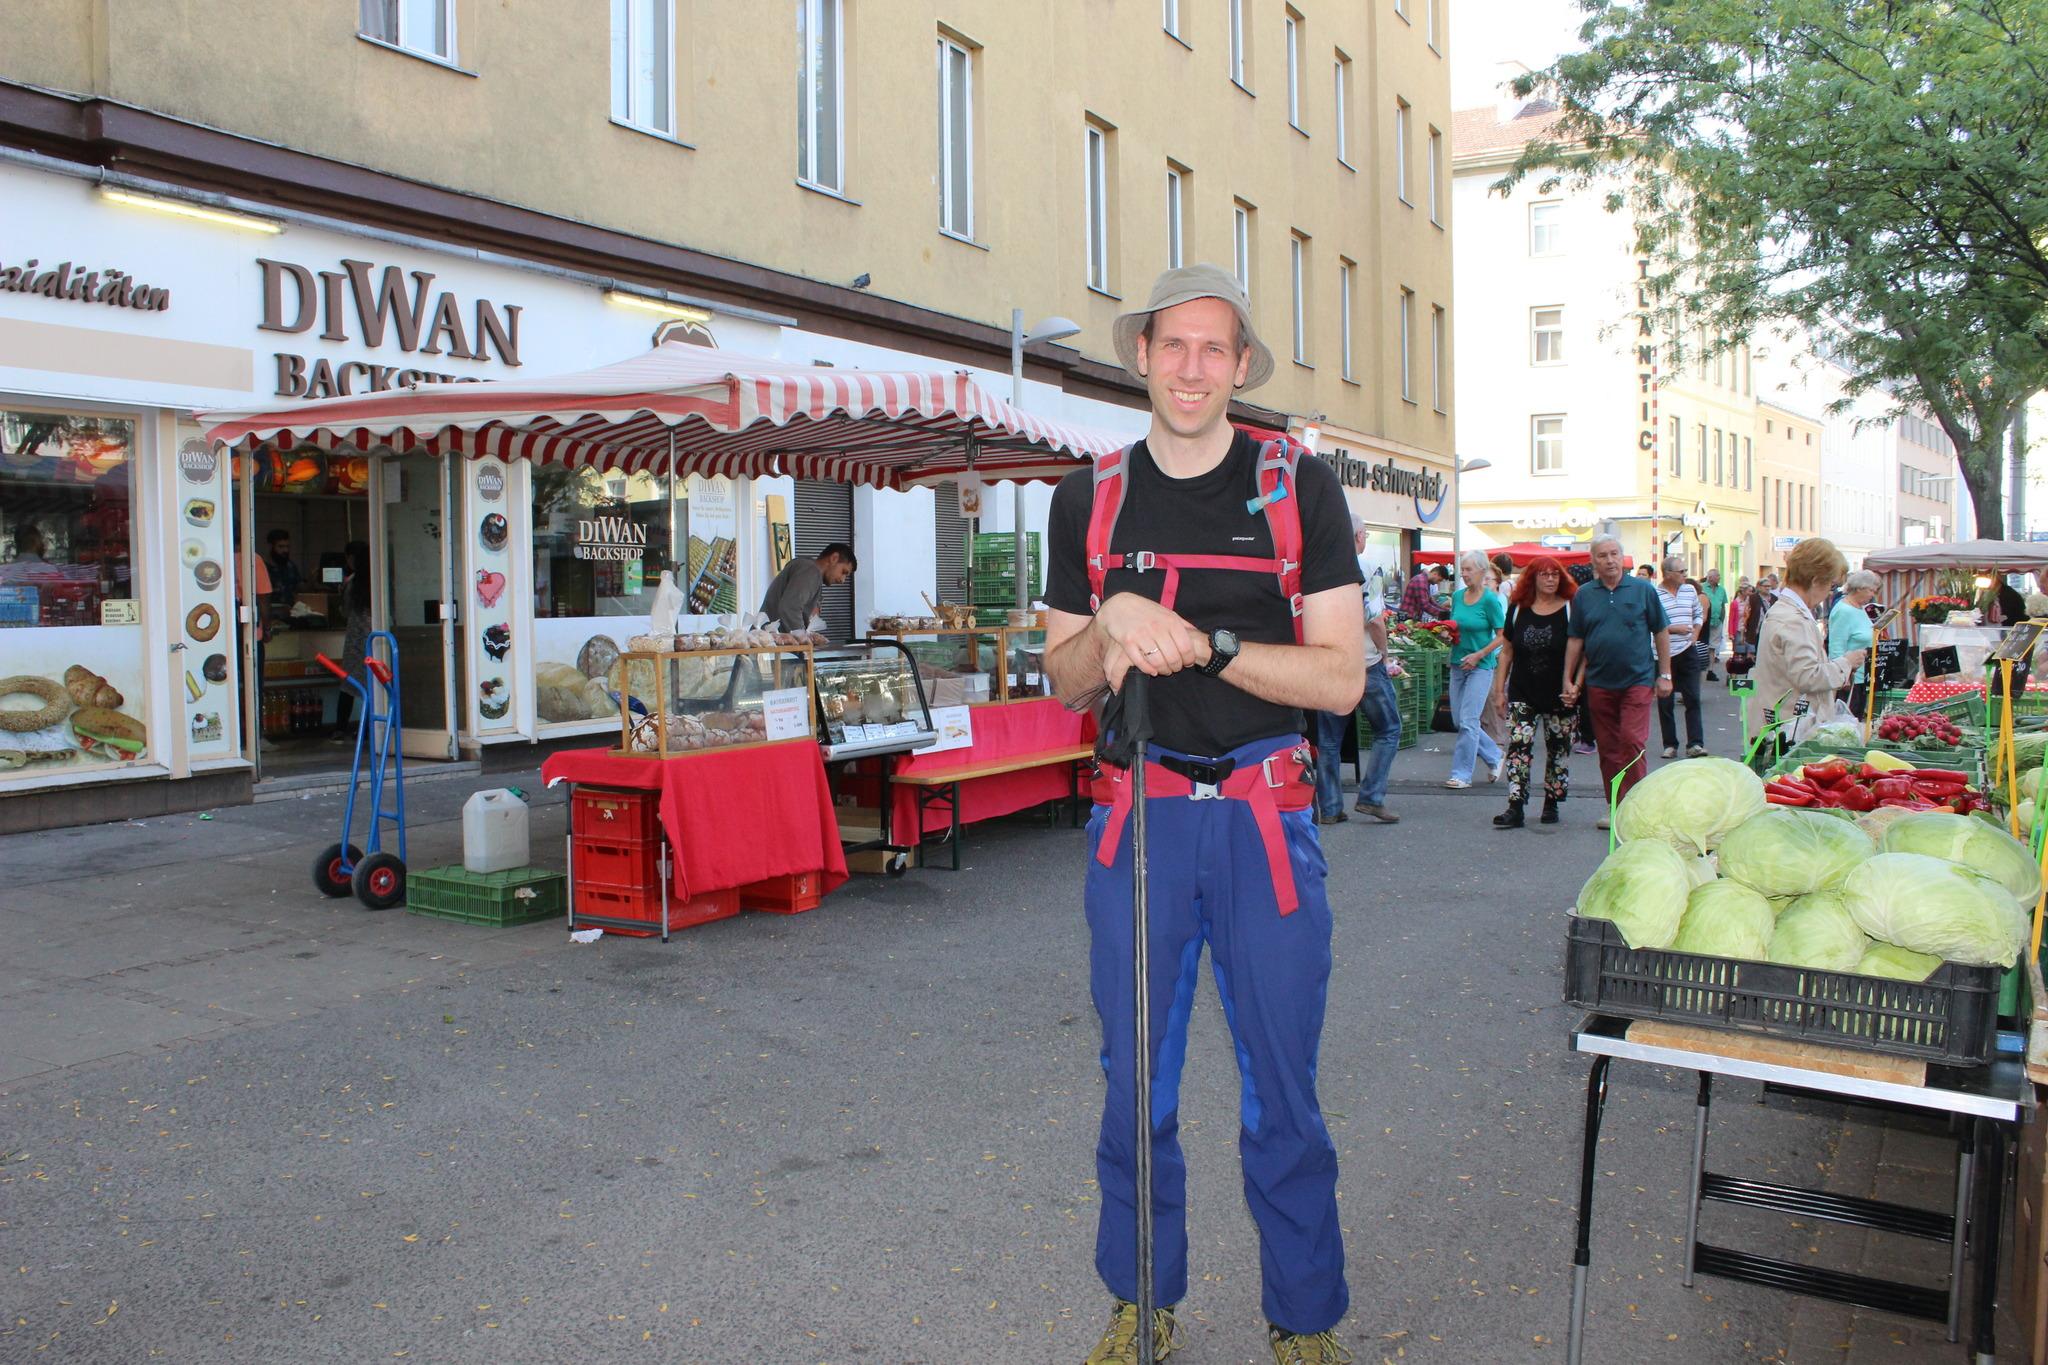 Bekanntschaften Wien Meidling - carolinavolksfolks.com